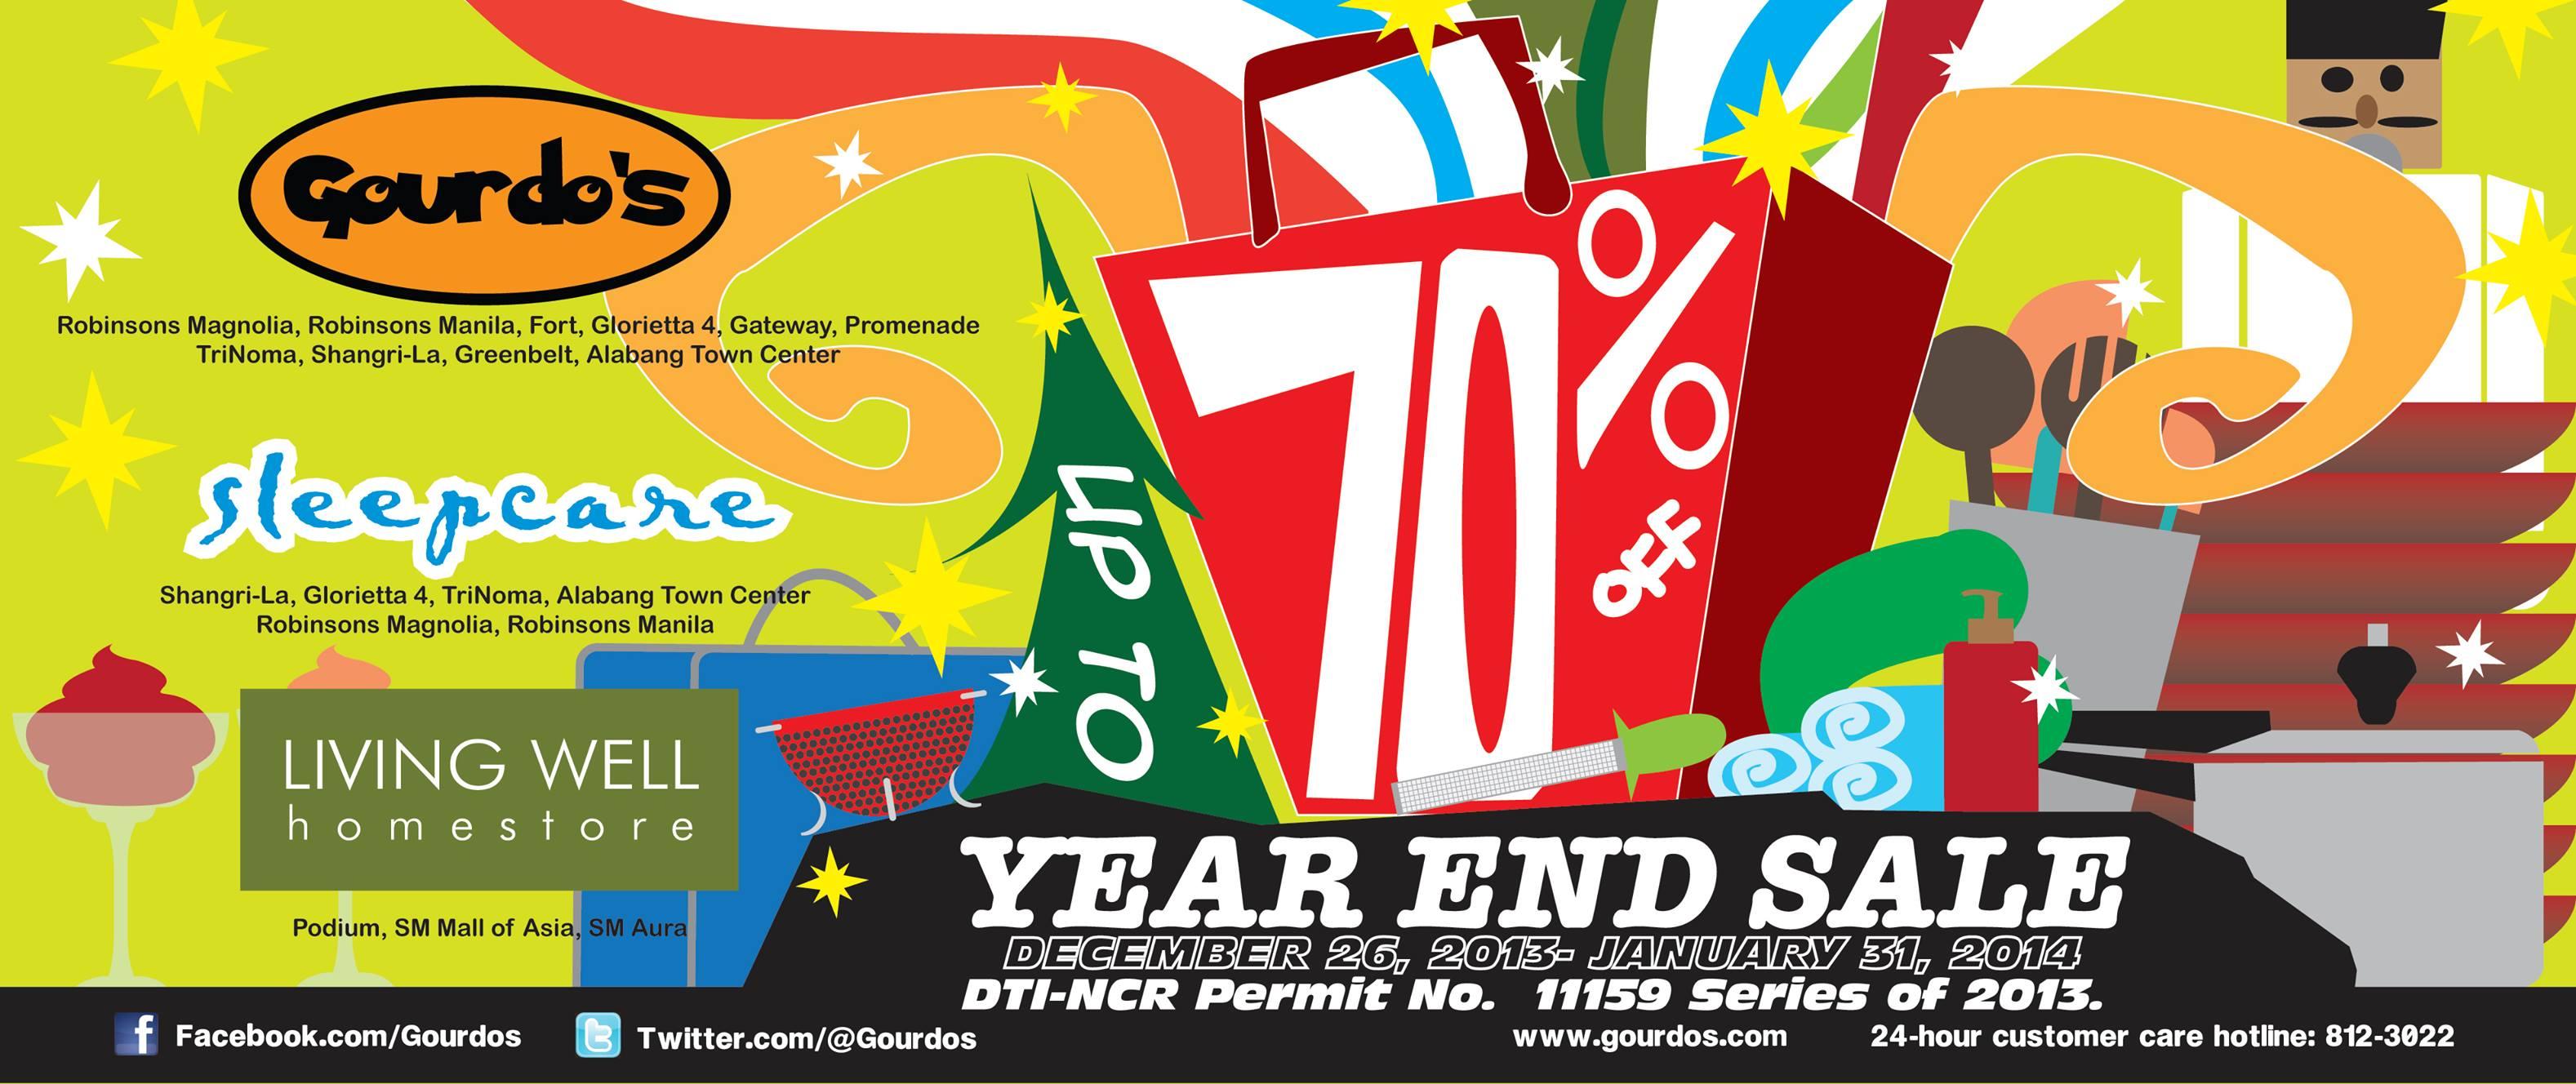 Gourdo's, Sleepcare, Living Well Year-End Sale January 2014